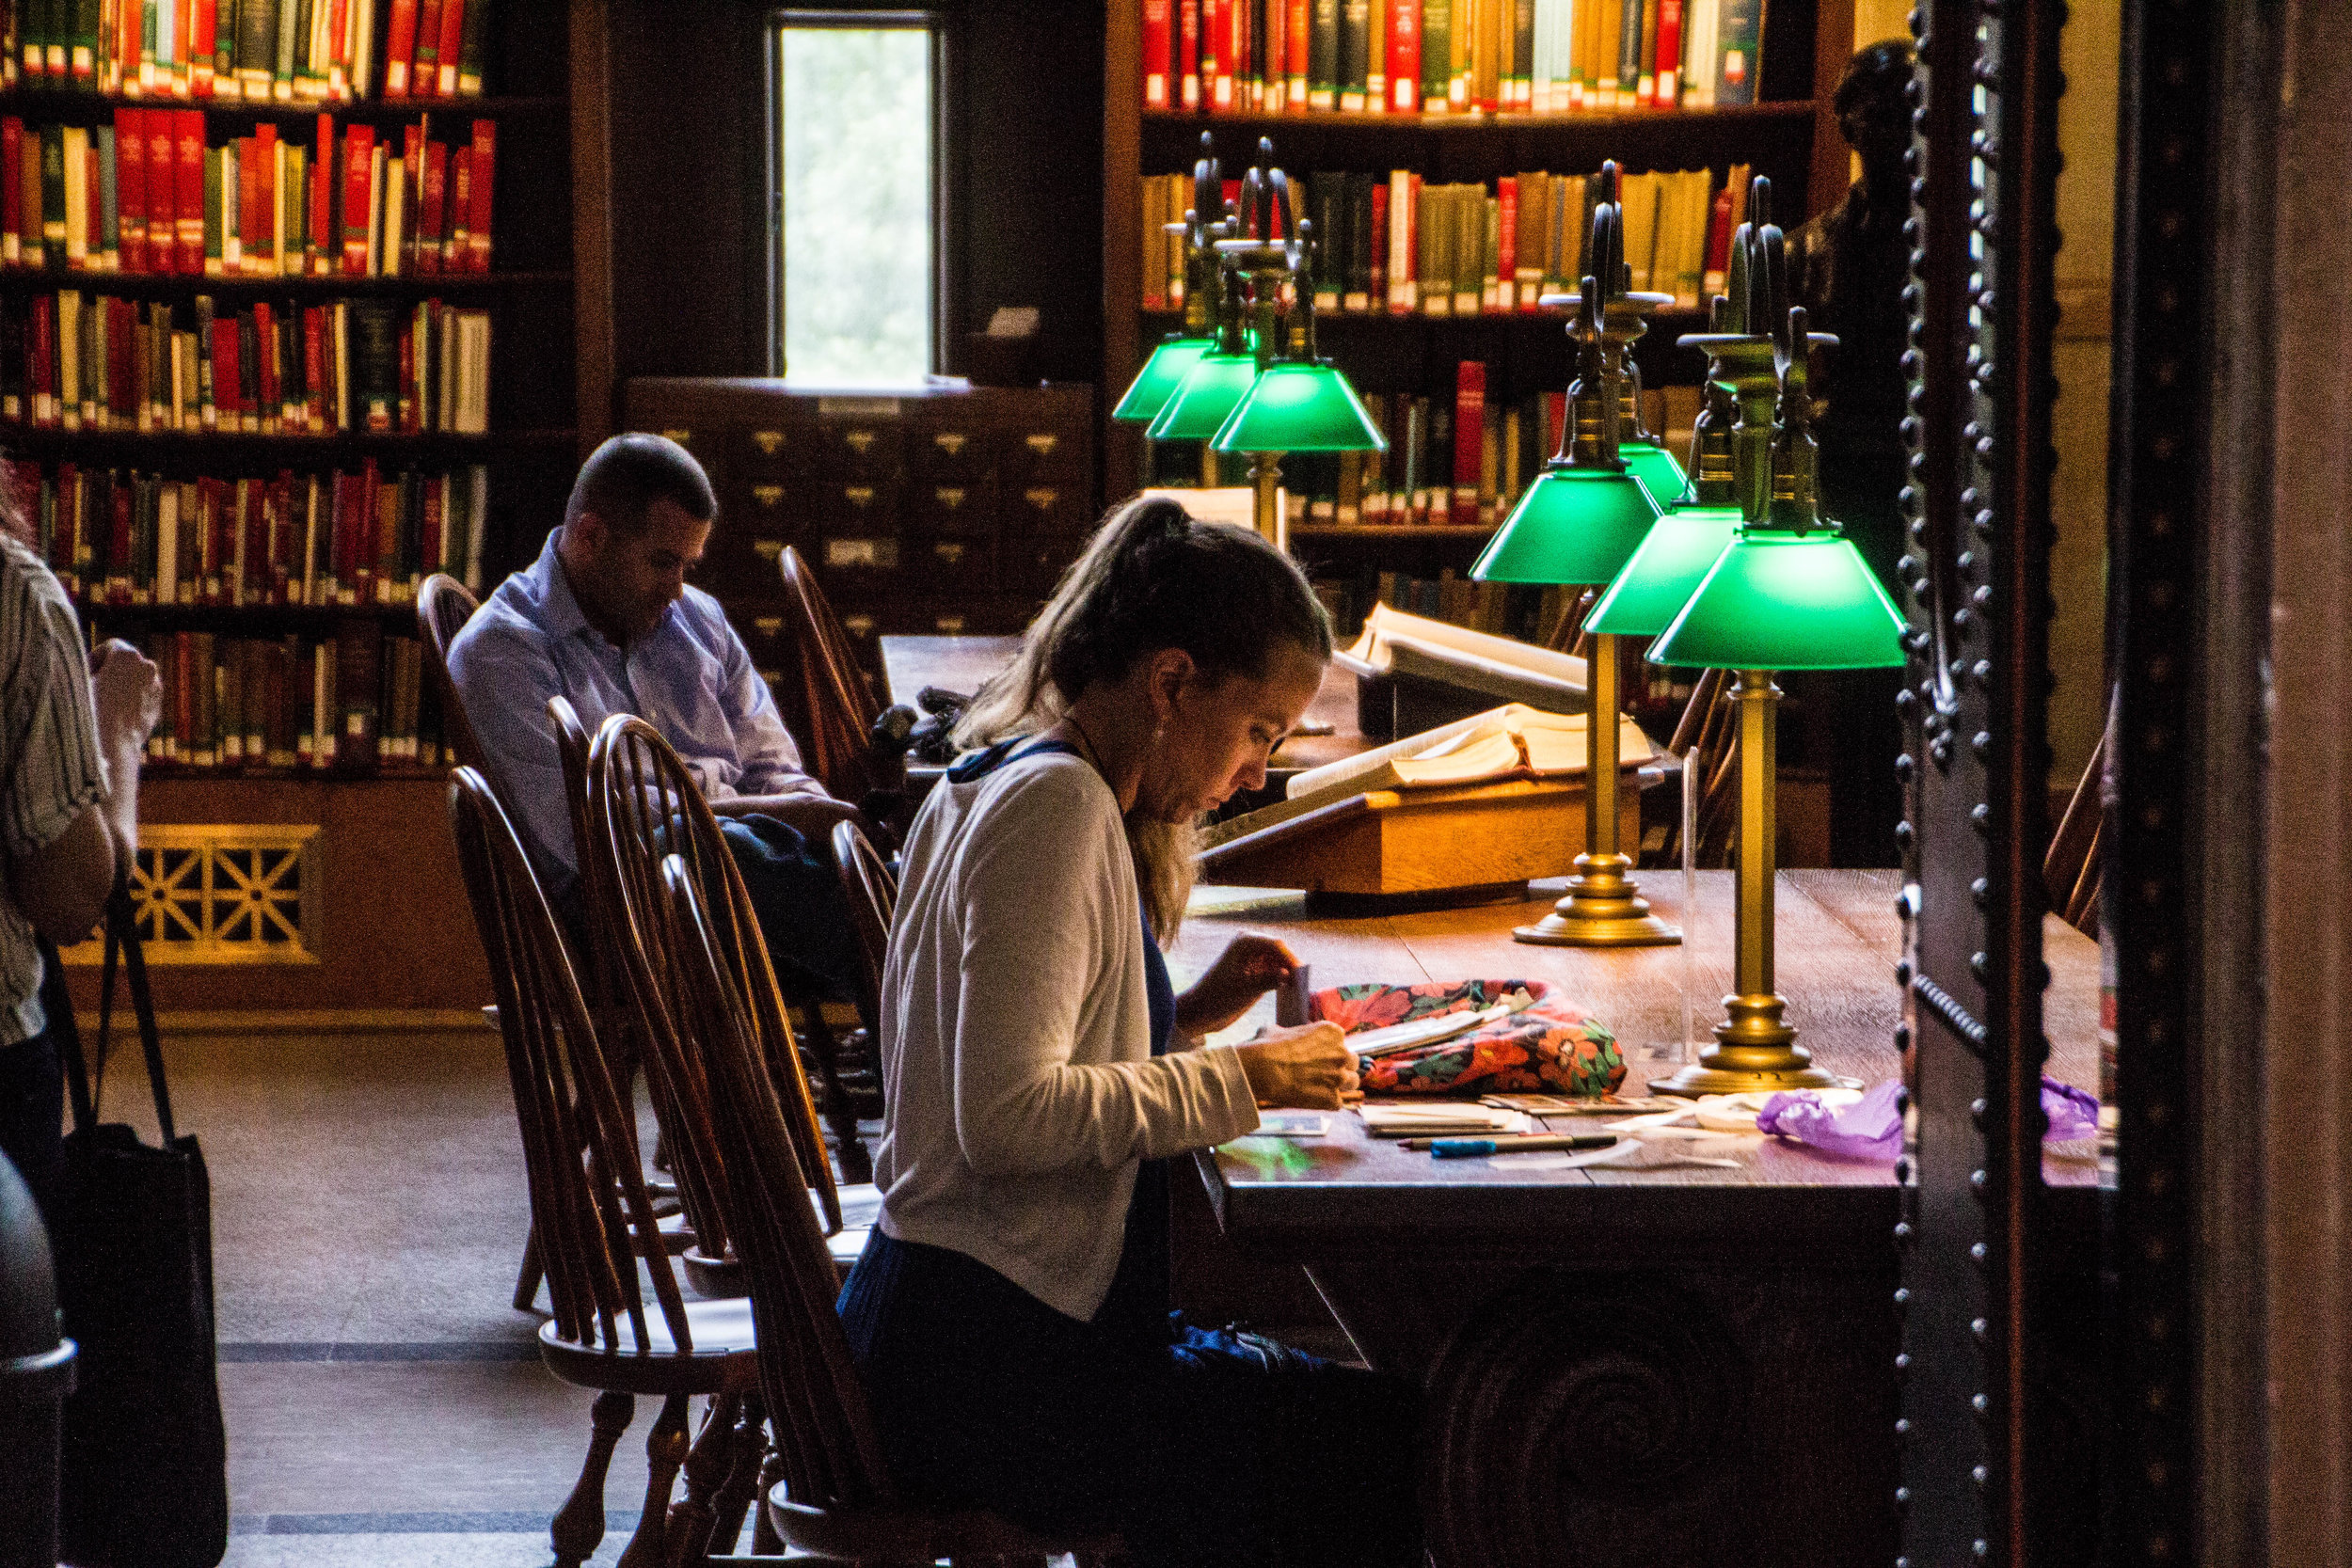 boston-public-library-photography-4.jpg